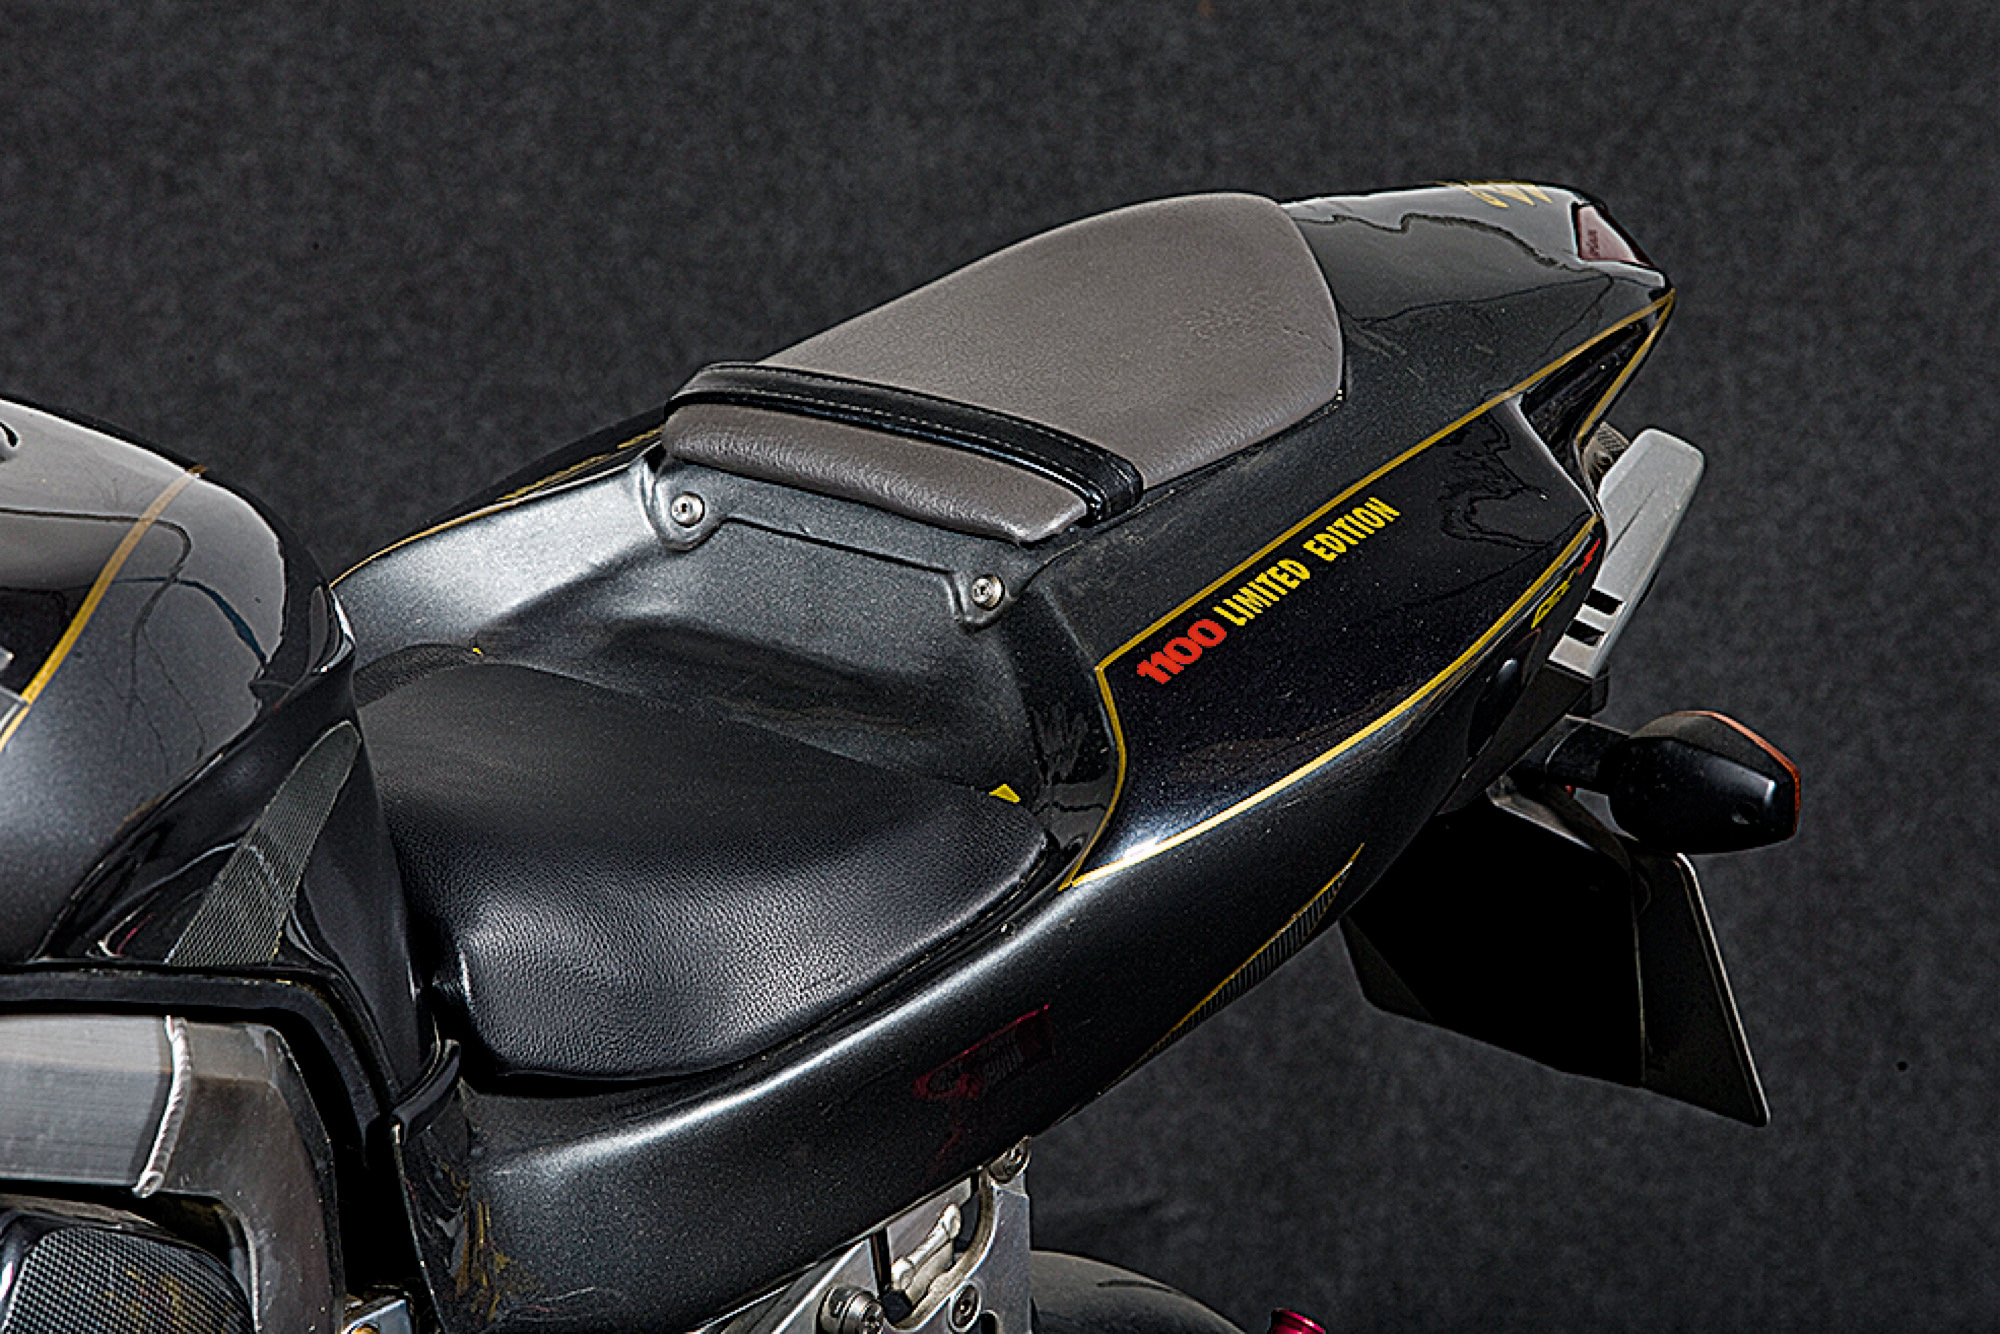 Suzuki GSX-R1100 Ultralight, fuera de serie